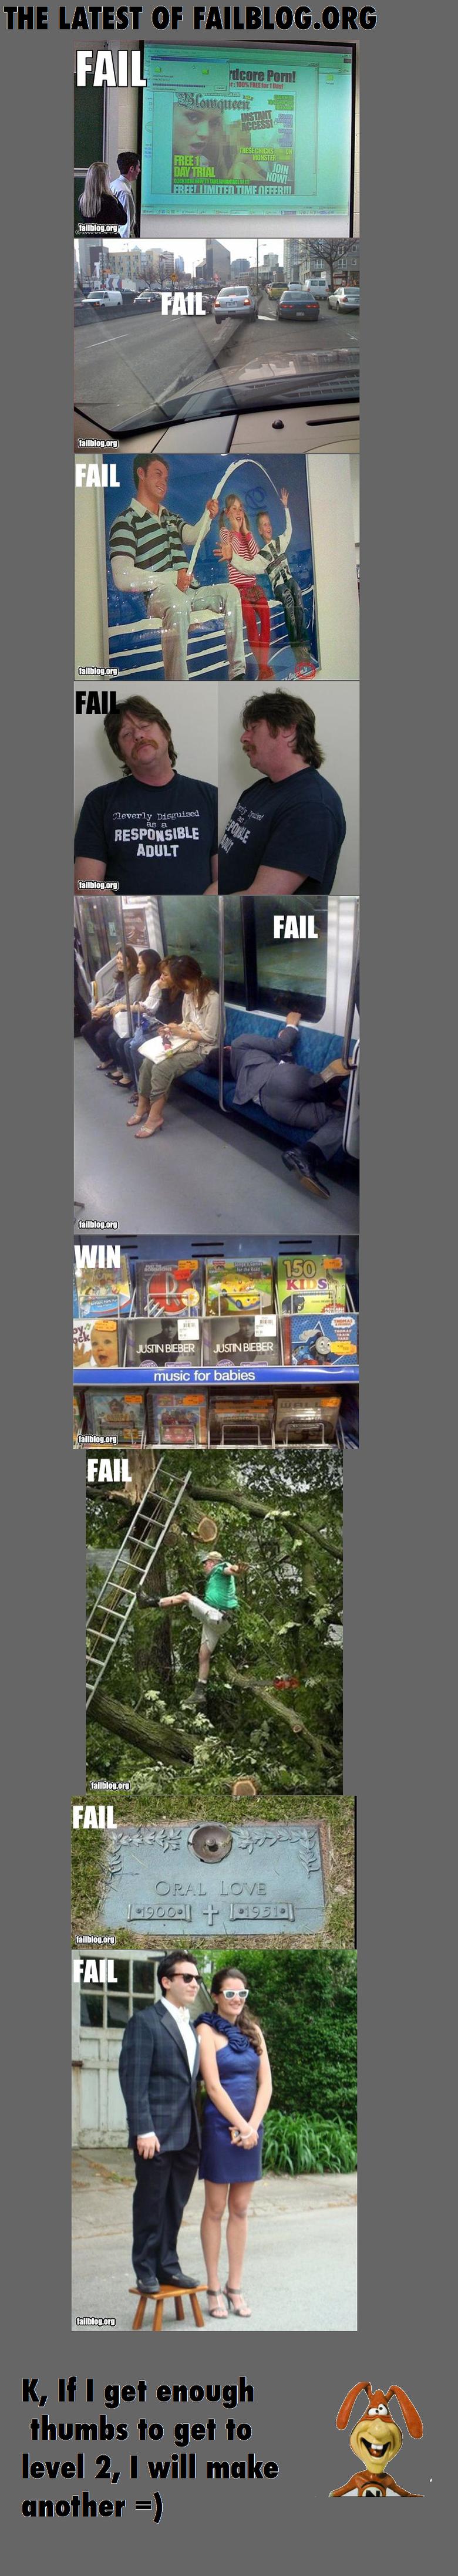 The Latest of FailBlog. I needa get to level 2.. paradox funny but i REALLY hate thumb whores